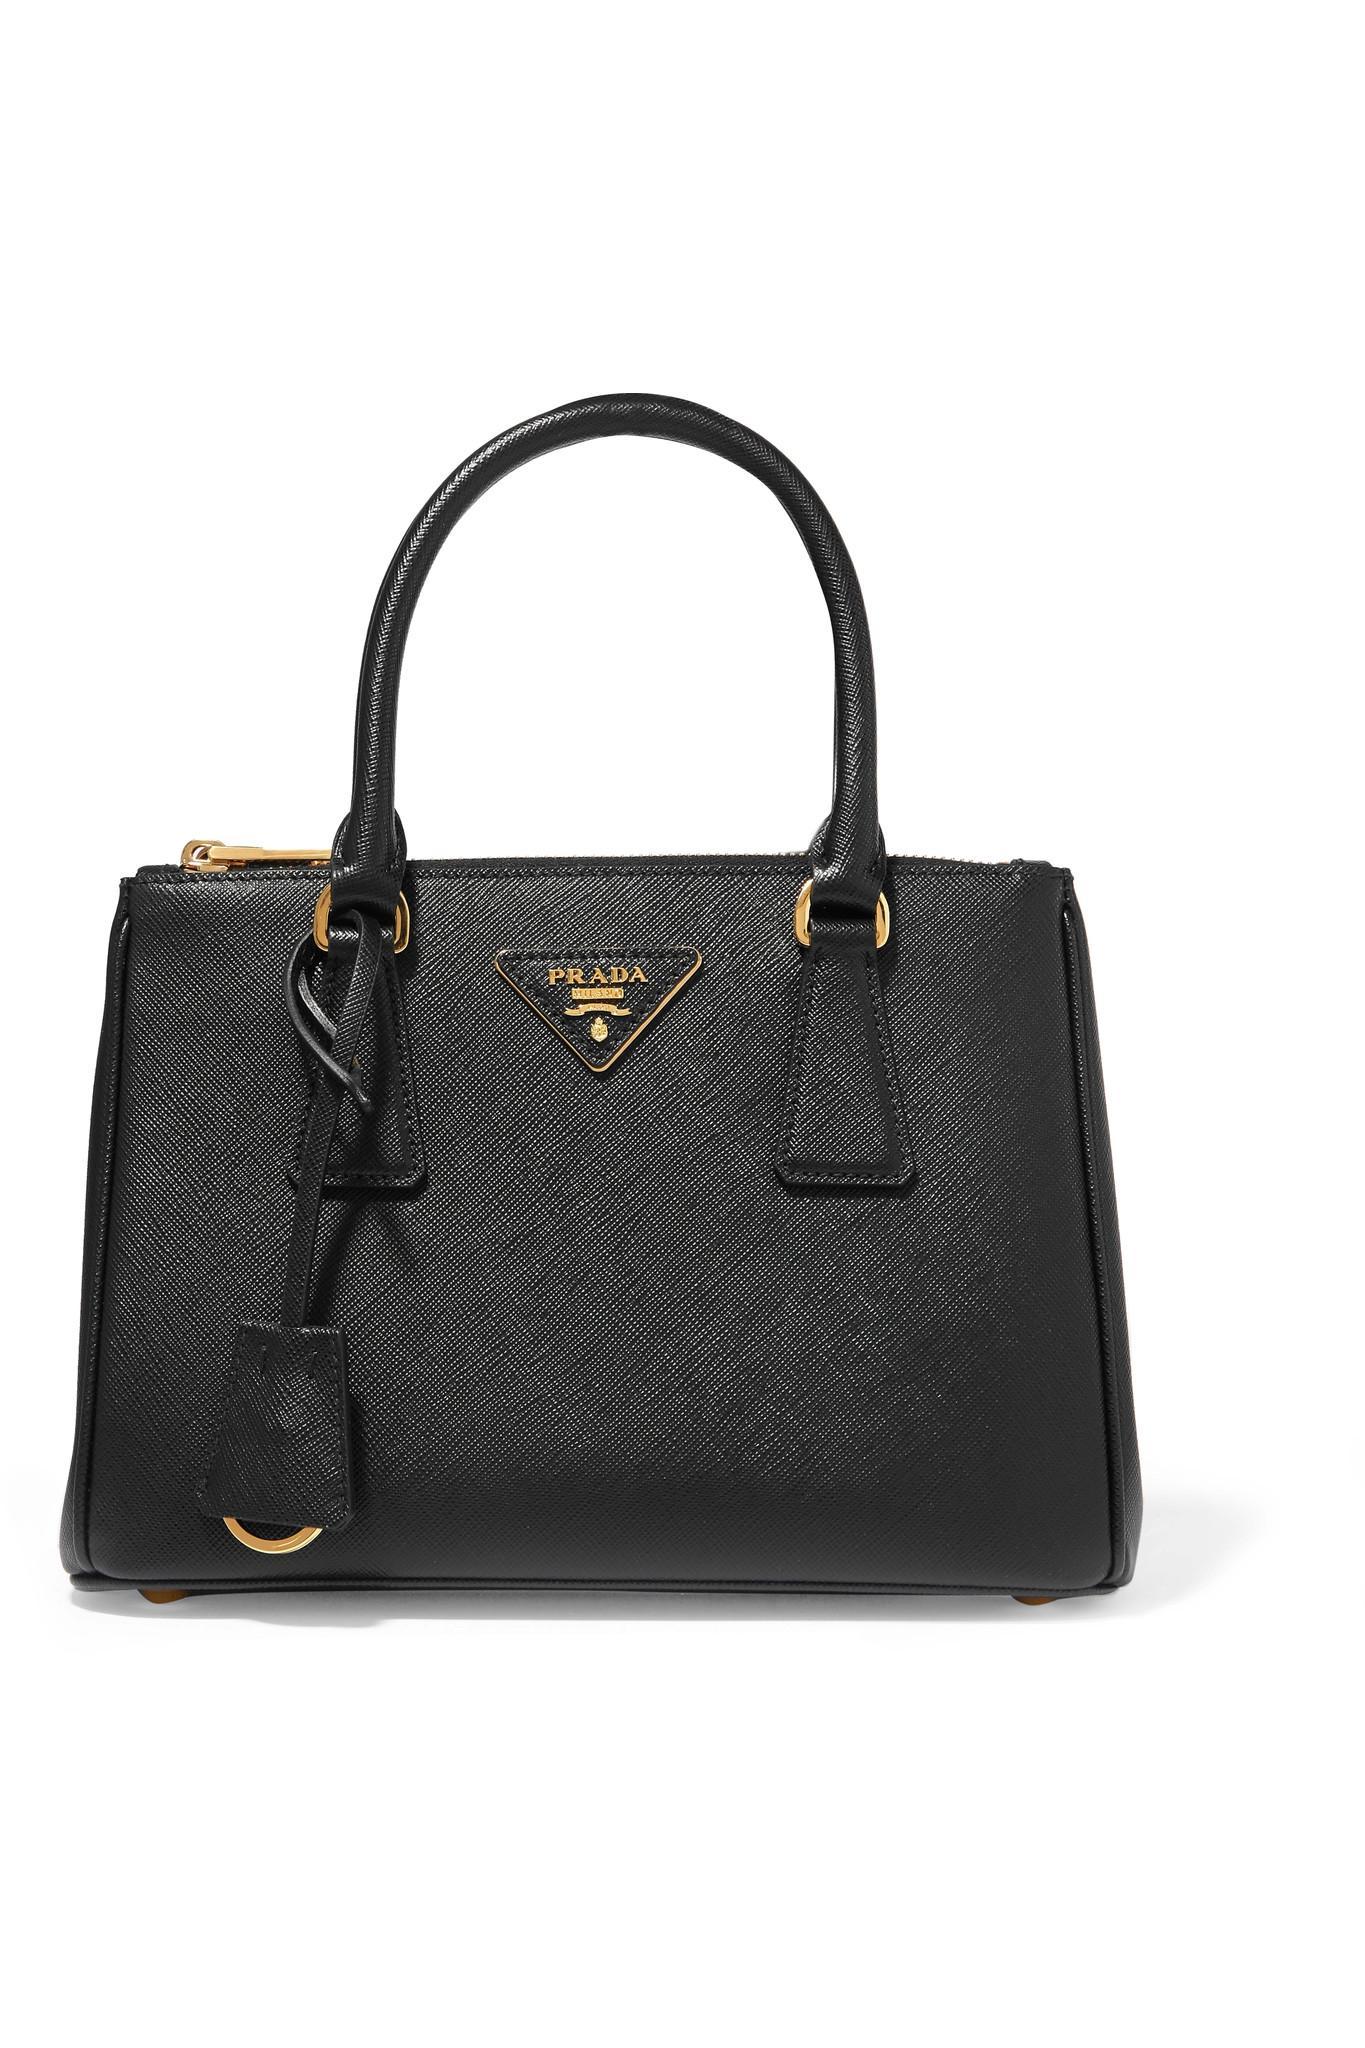 3b67eb3321c Prada - Black Galleria Mini Textured-leather Tote - Lyst. View fullscreen